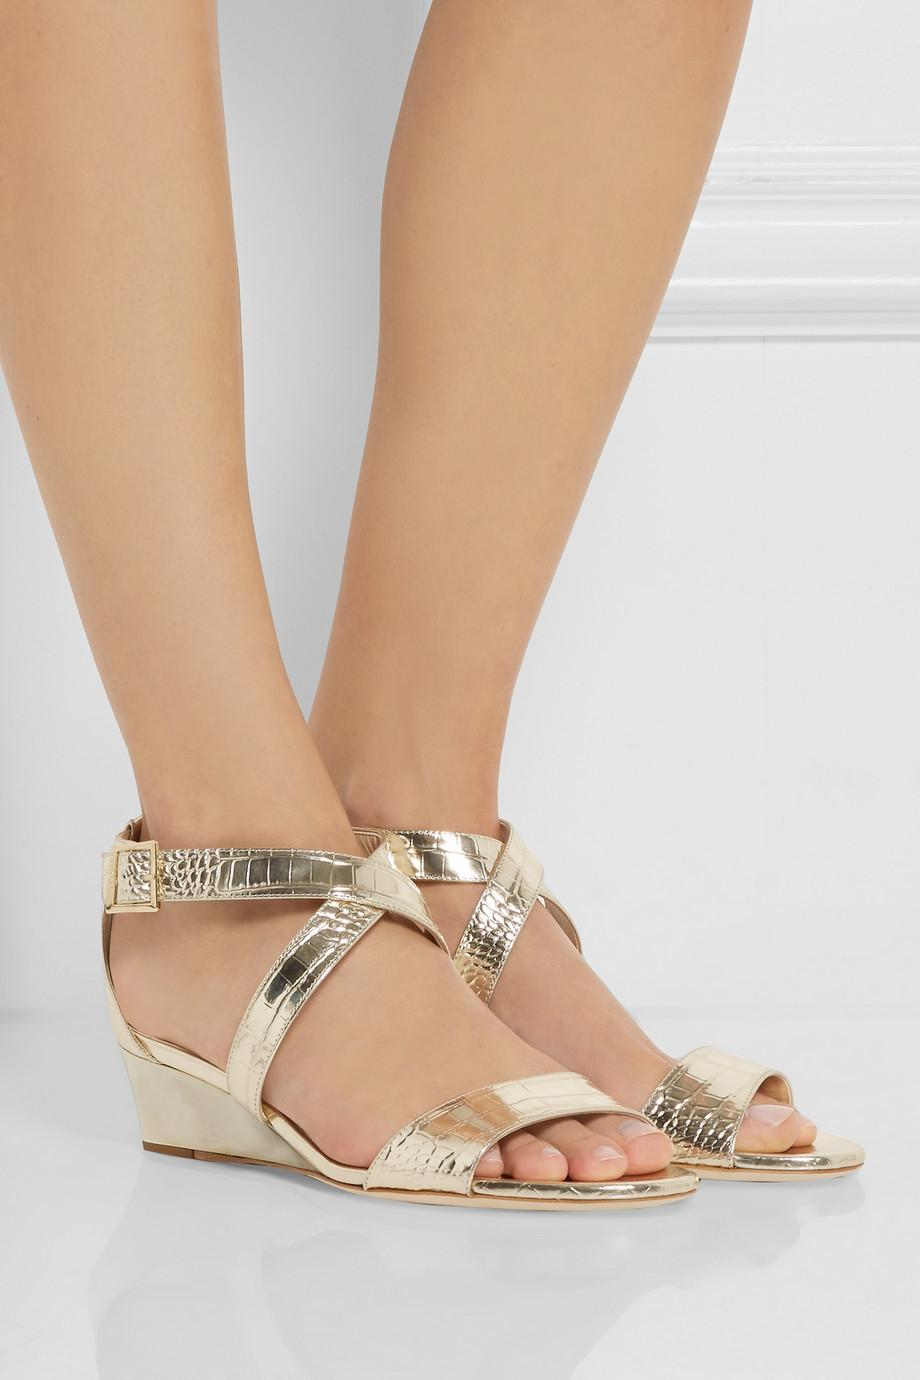 cdbafc531c7 Lyst - Jimmy Choo Chiara Croc-Effect Metallic Leather Wedge Sandals ...